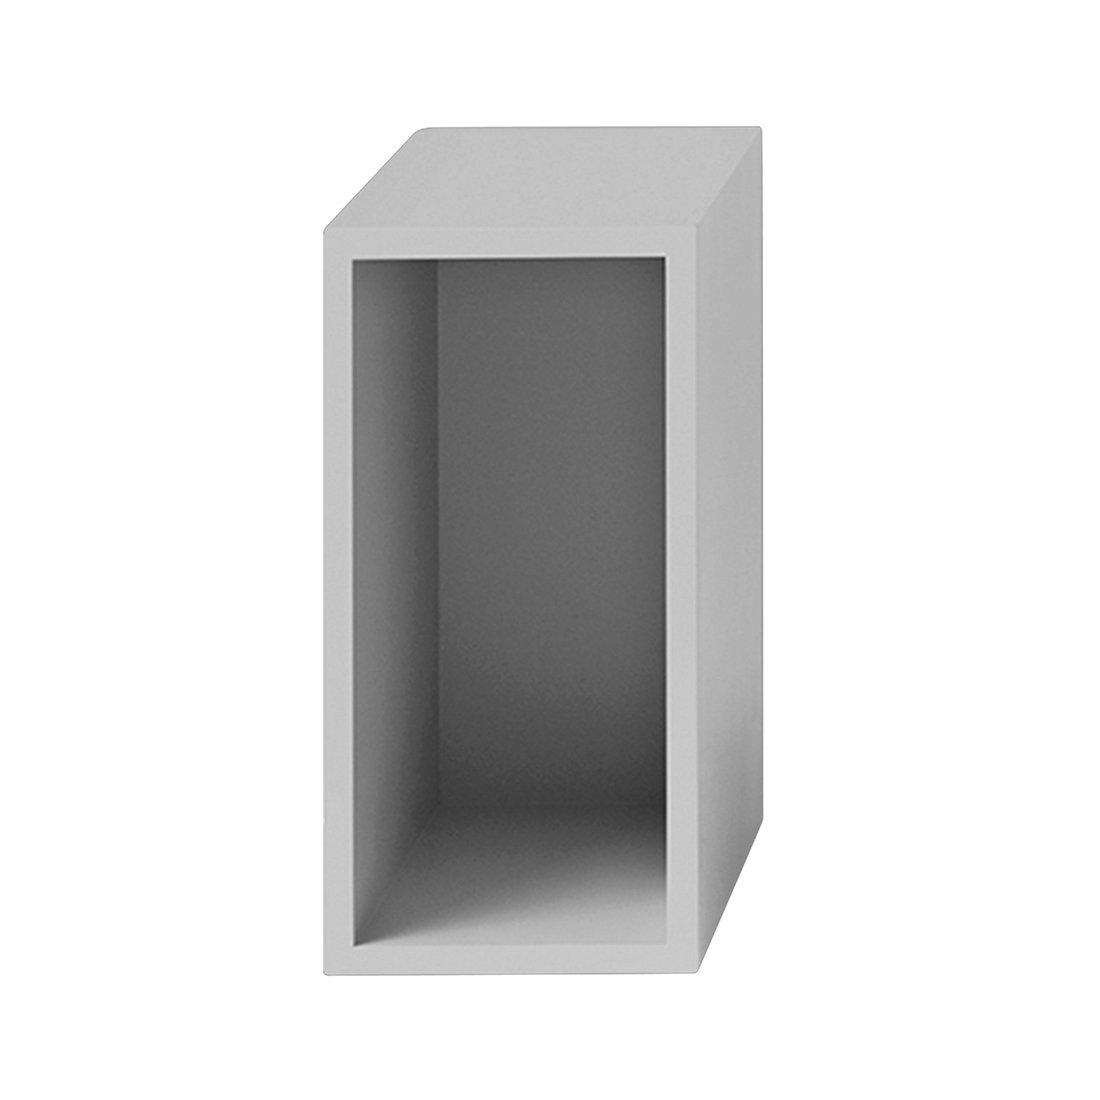 Muuto Stacked 2.0 Modules Small Lichtgrijs/Dicht